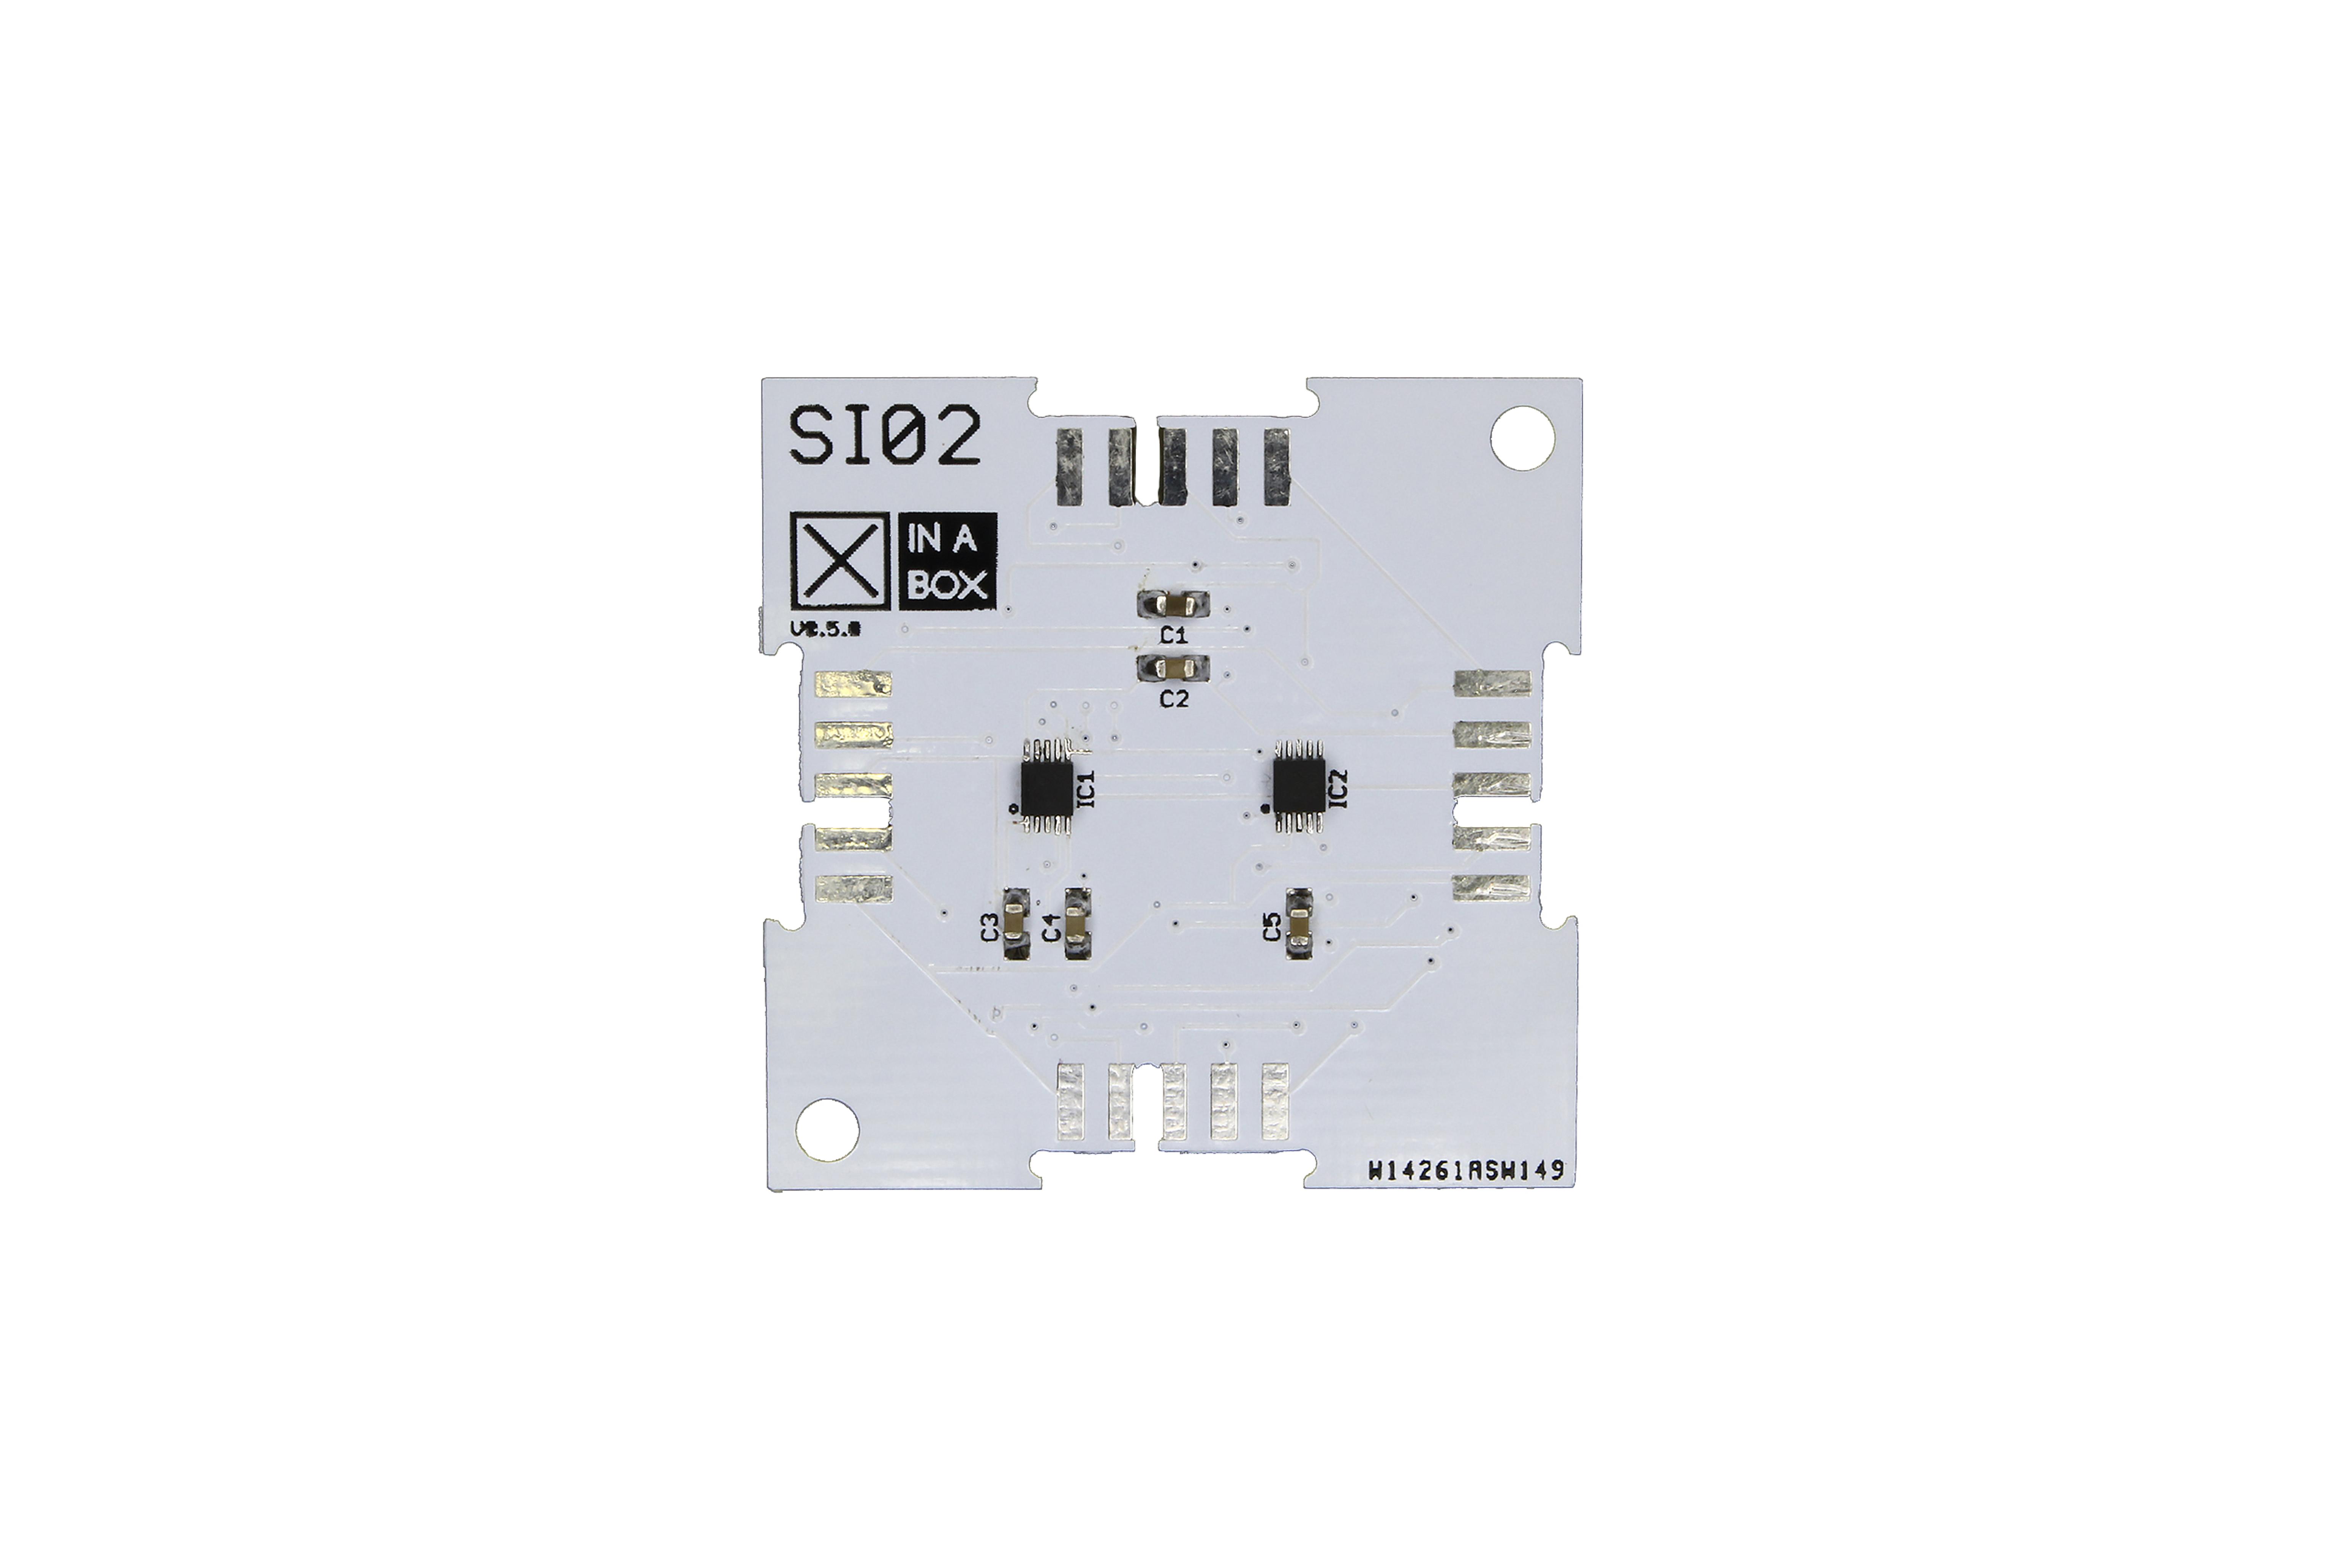 IMU 6DoF(MAG3110およびMMA8653fc)